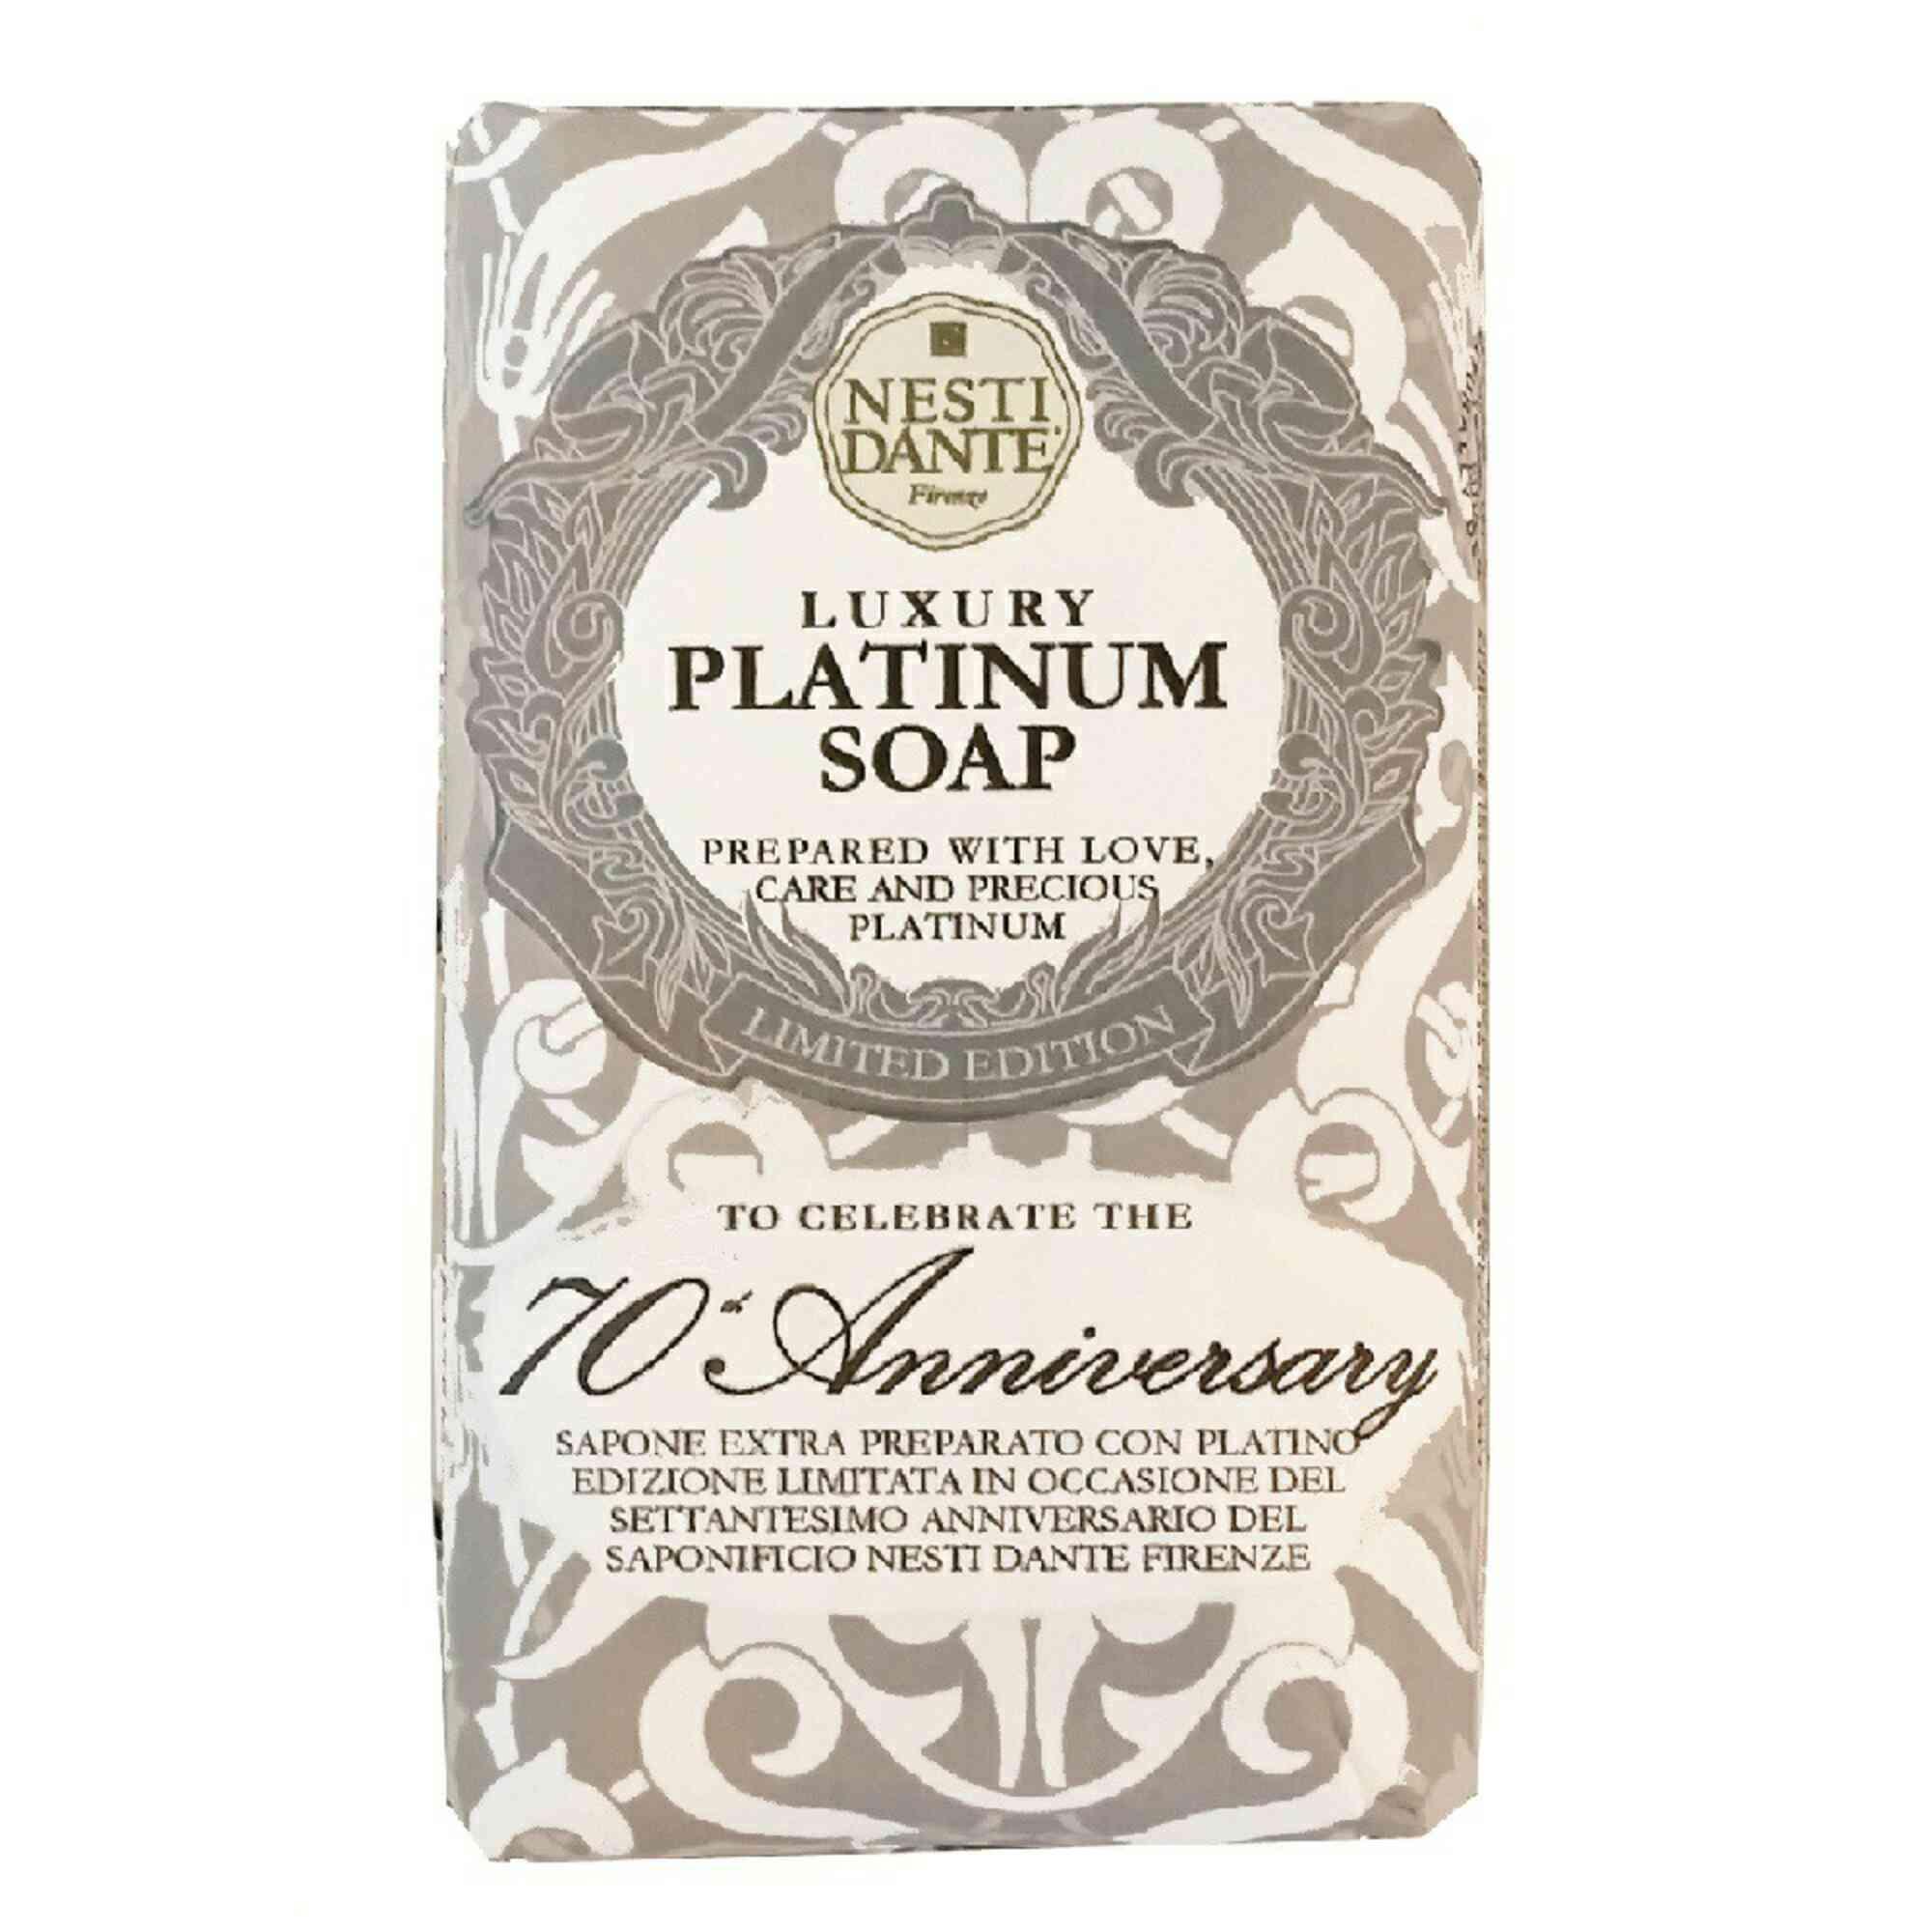 Sabonete Barra Luxury Platinum Soap 250gr Nesti Dante